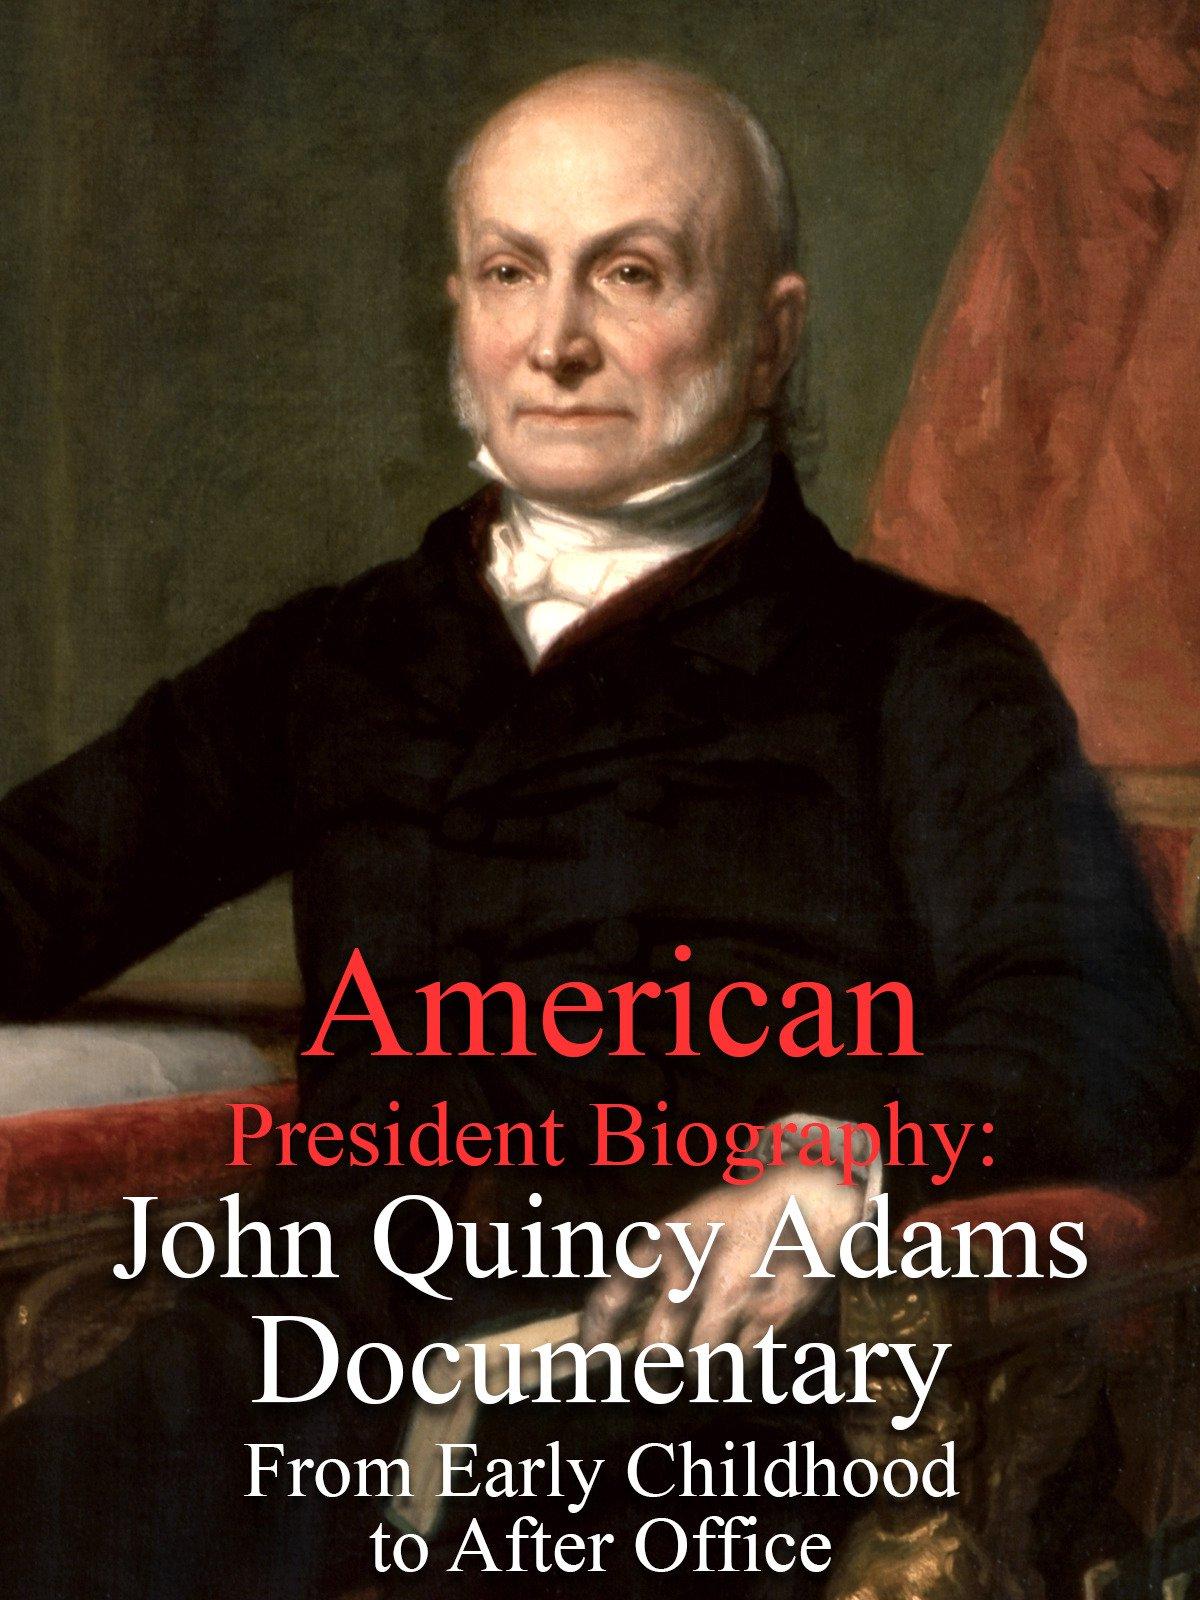 Watch American President Biography John Quincy Adams